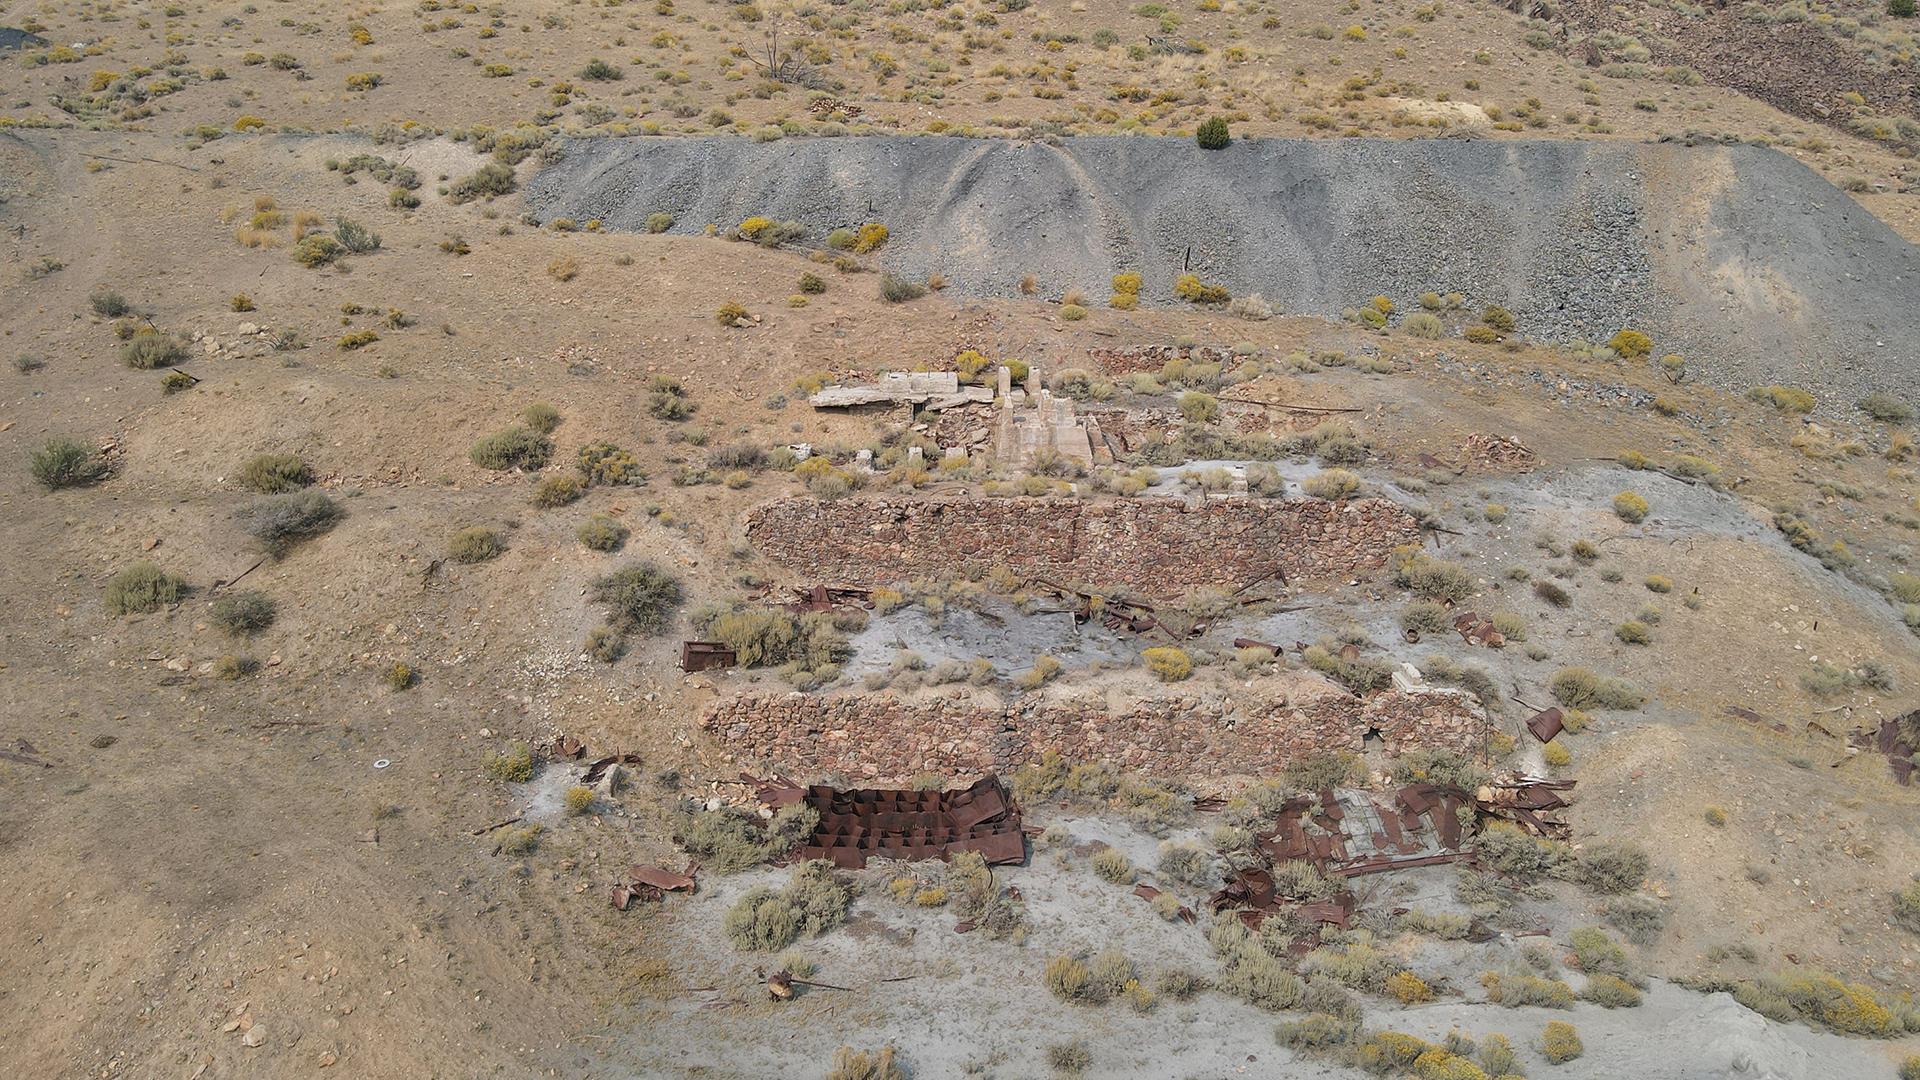 Processing plant site at Arizona Mine FOJ